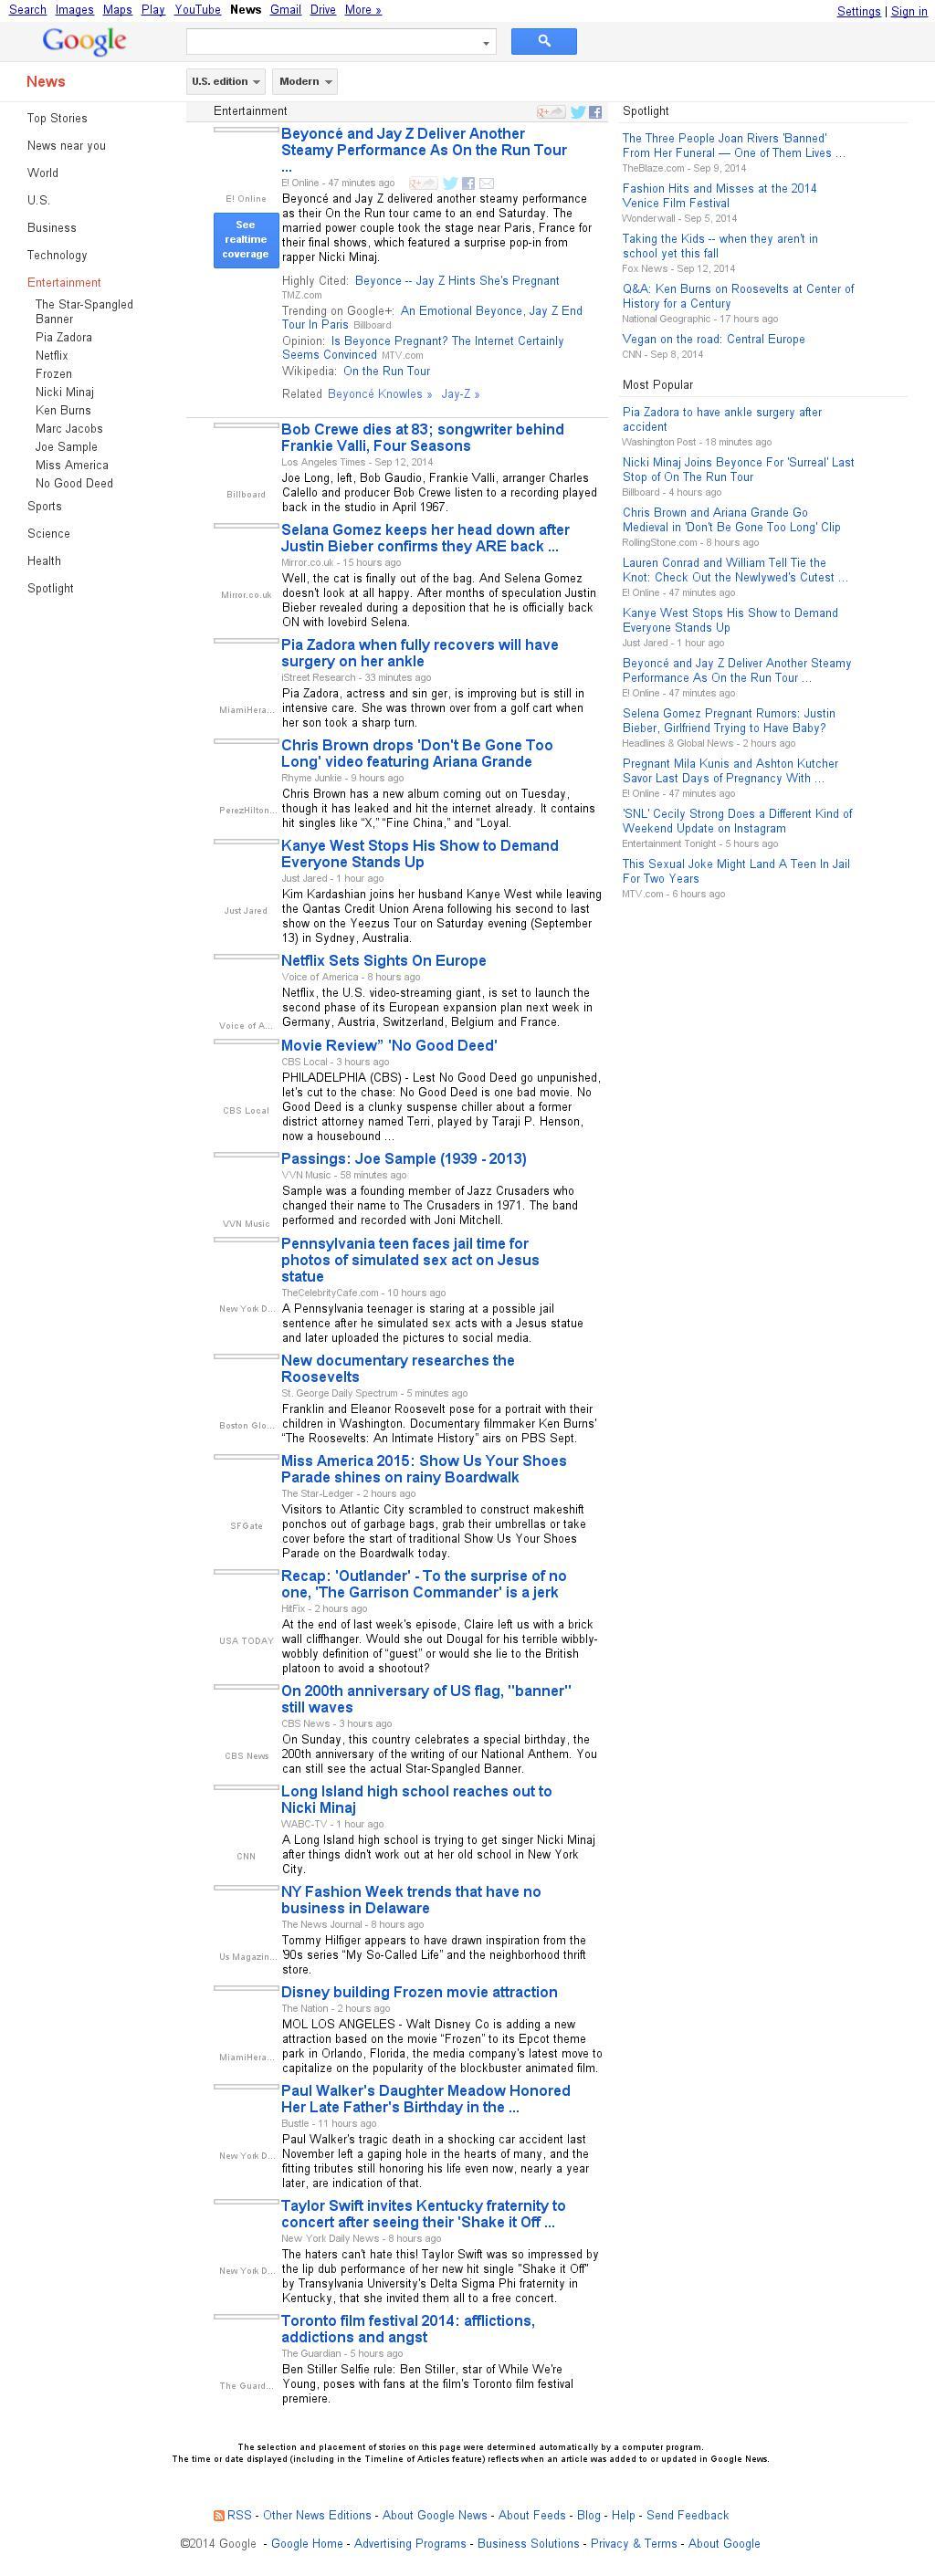 Google News: Entertainment at Sunday Sept. 14, 2014, 5:06 a.m. UTC